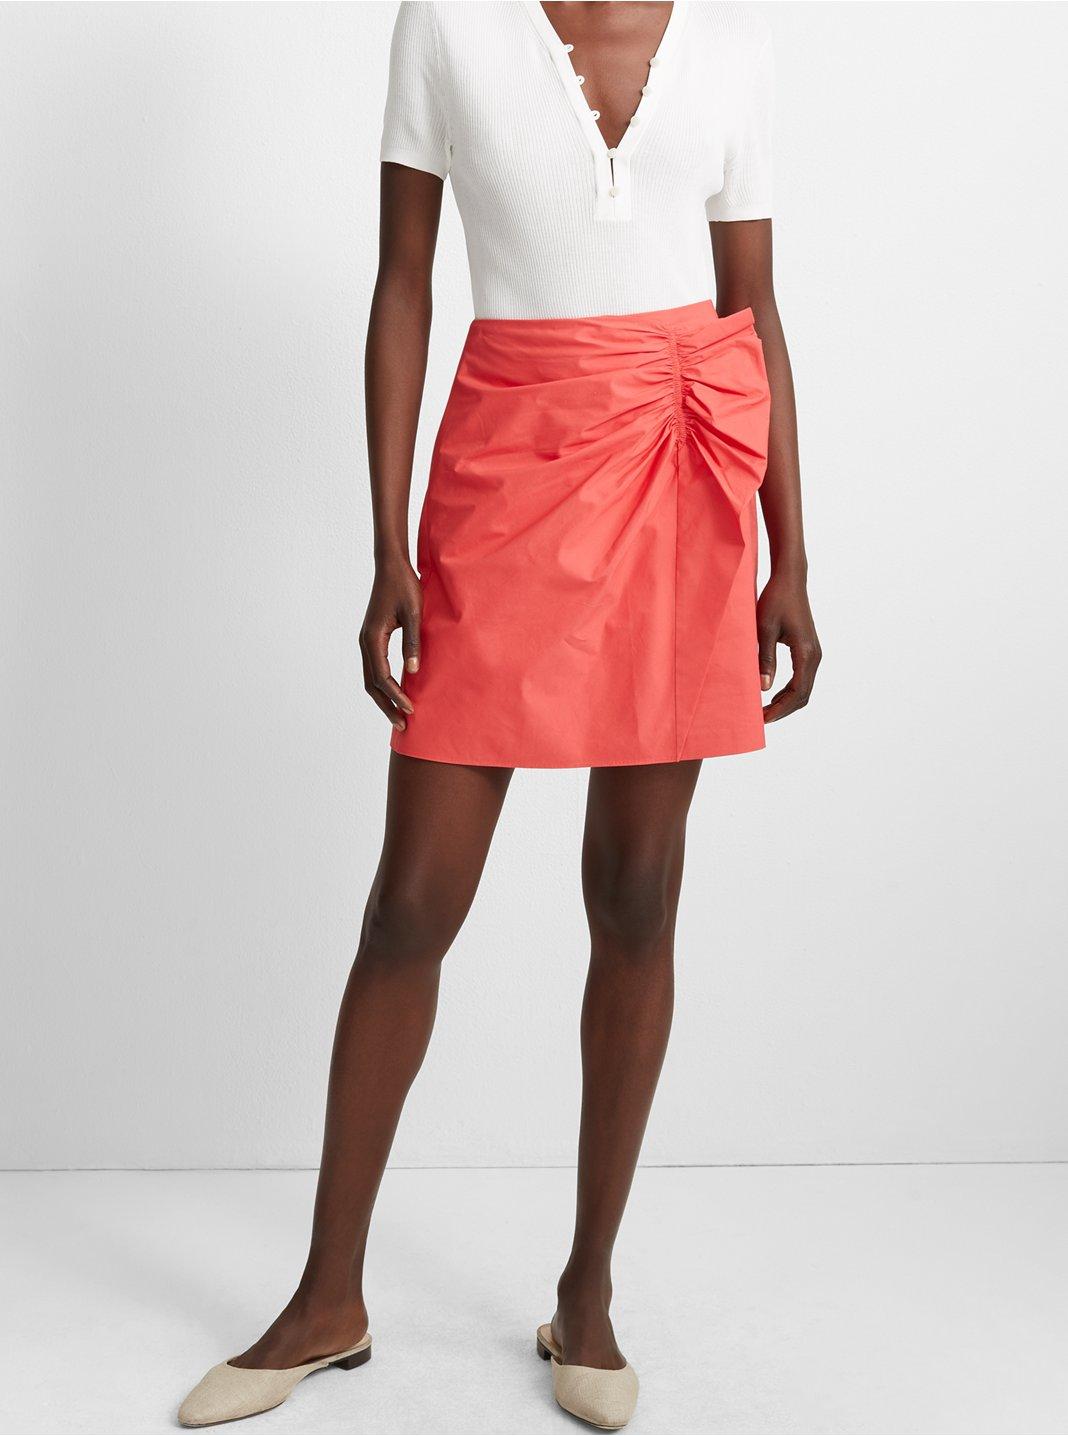 Normaah Skirt